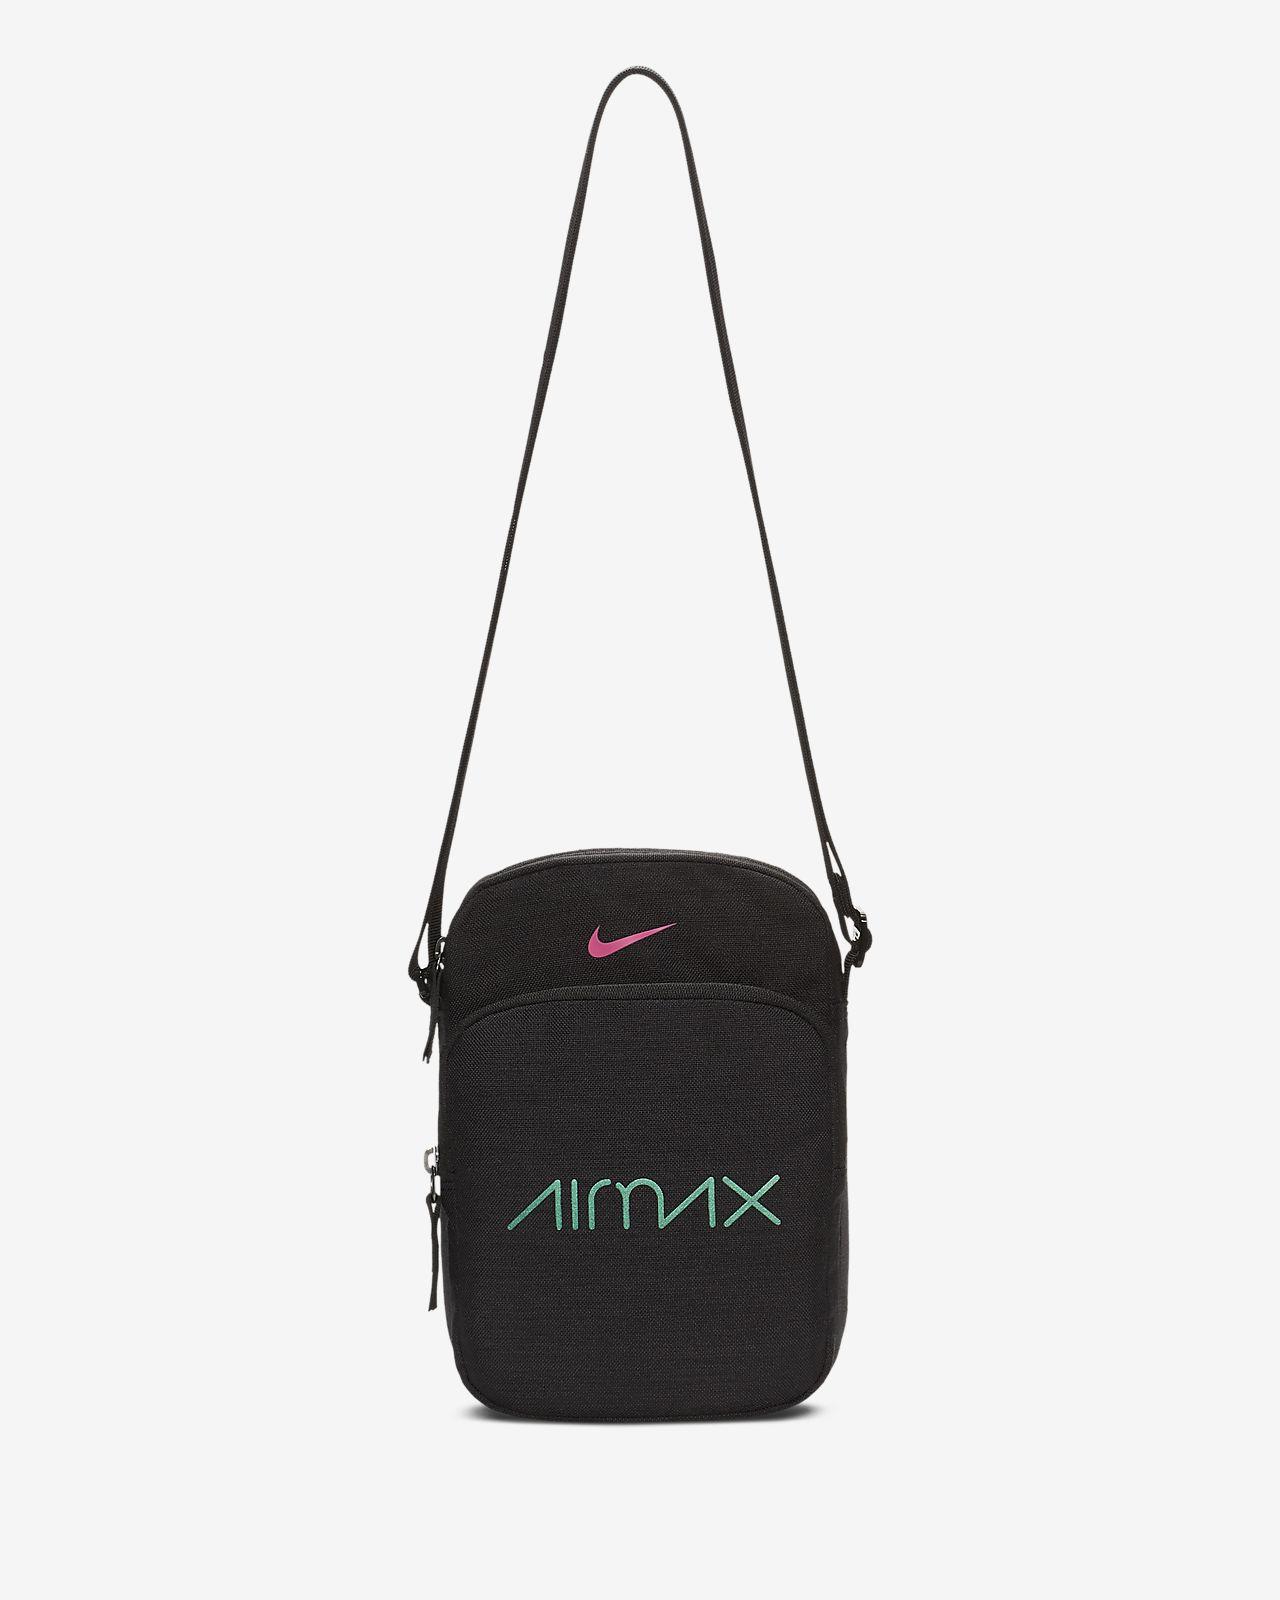 Nike Heritage Air Max Day Bossa per a objectes petits